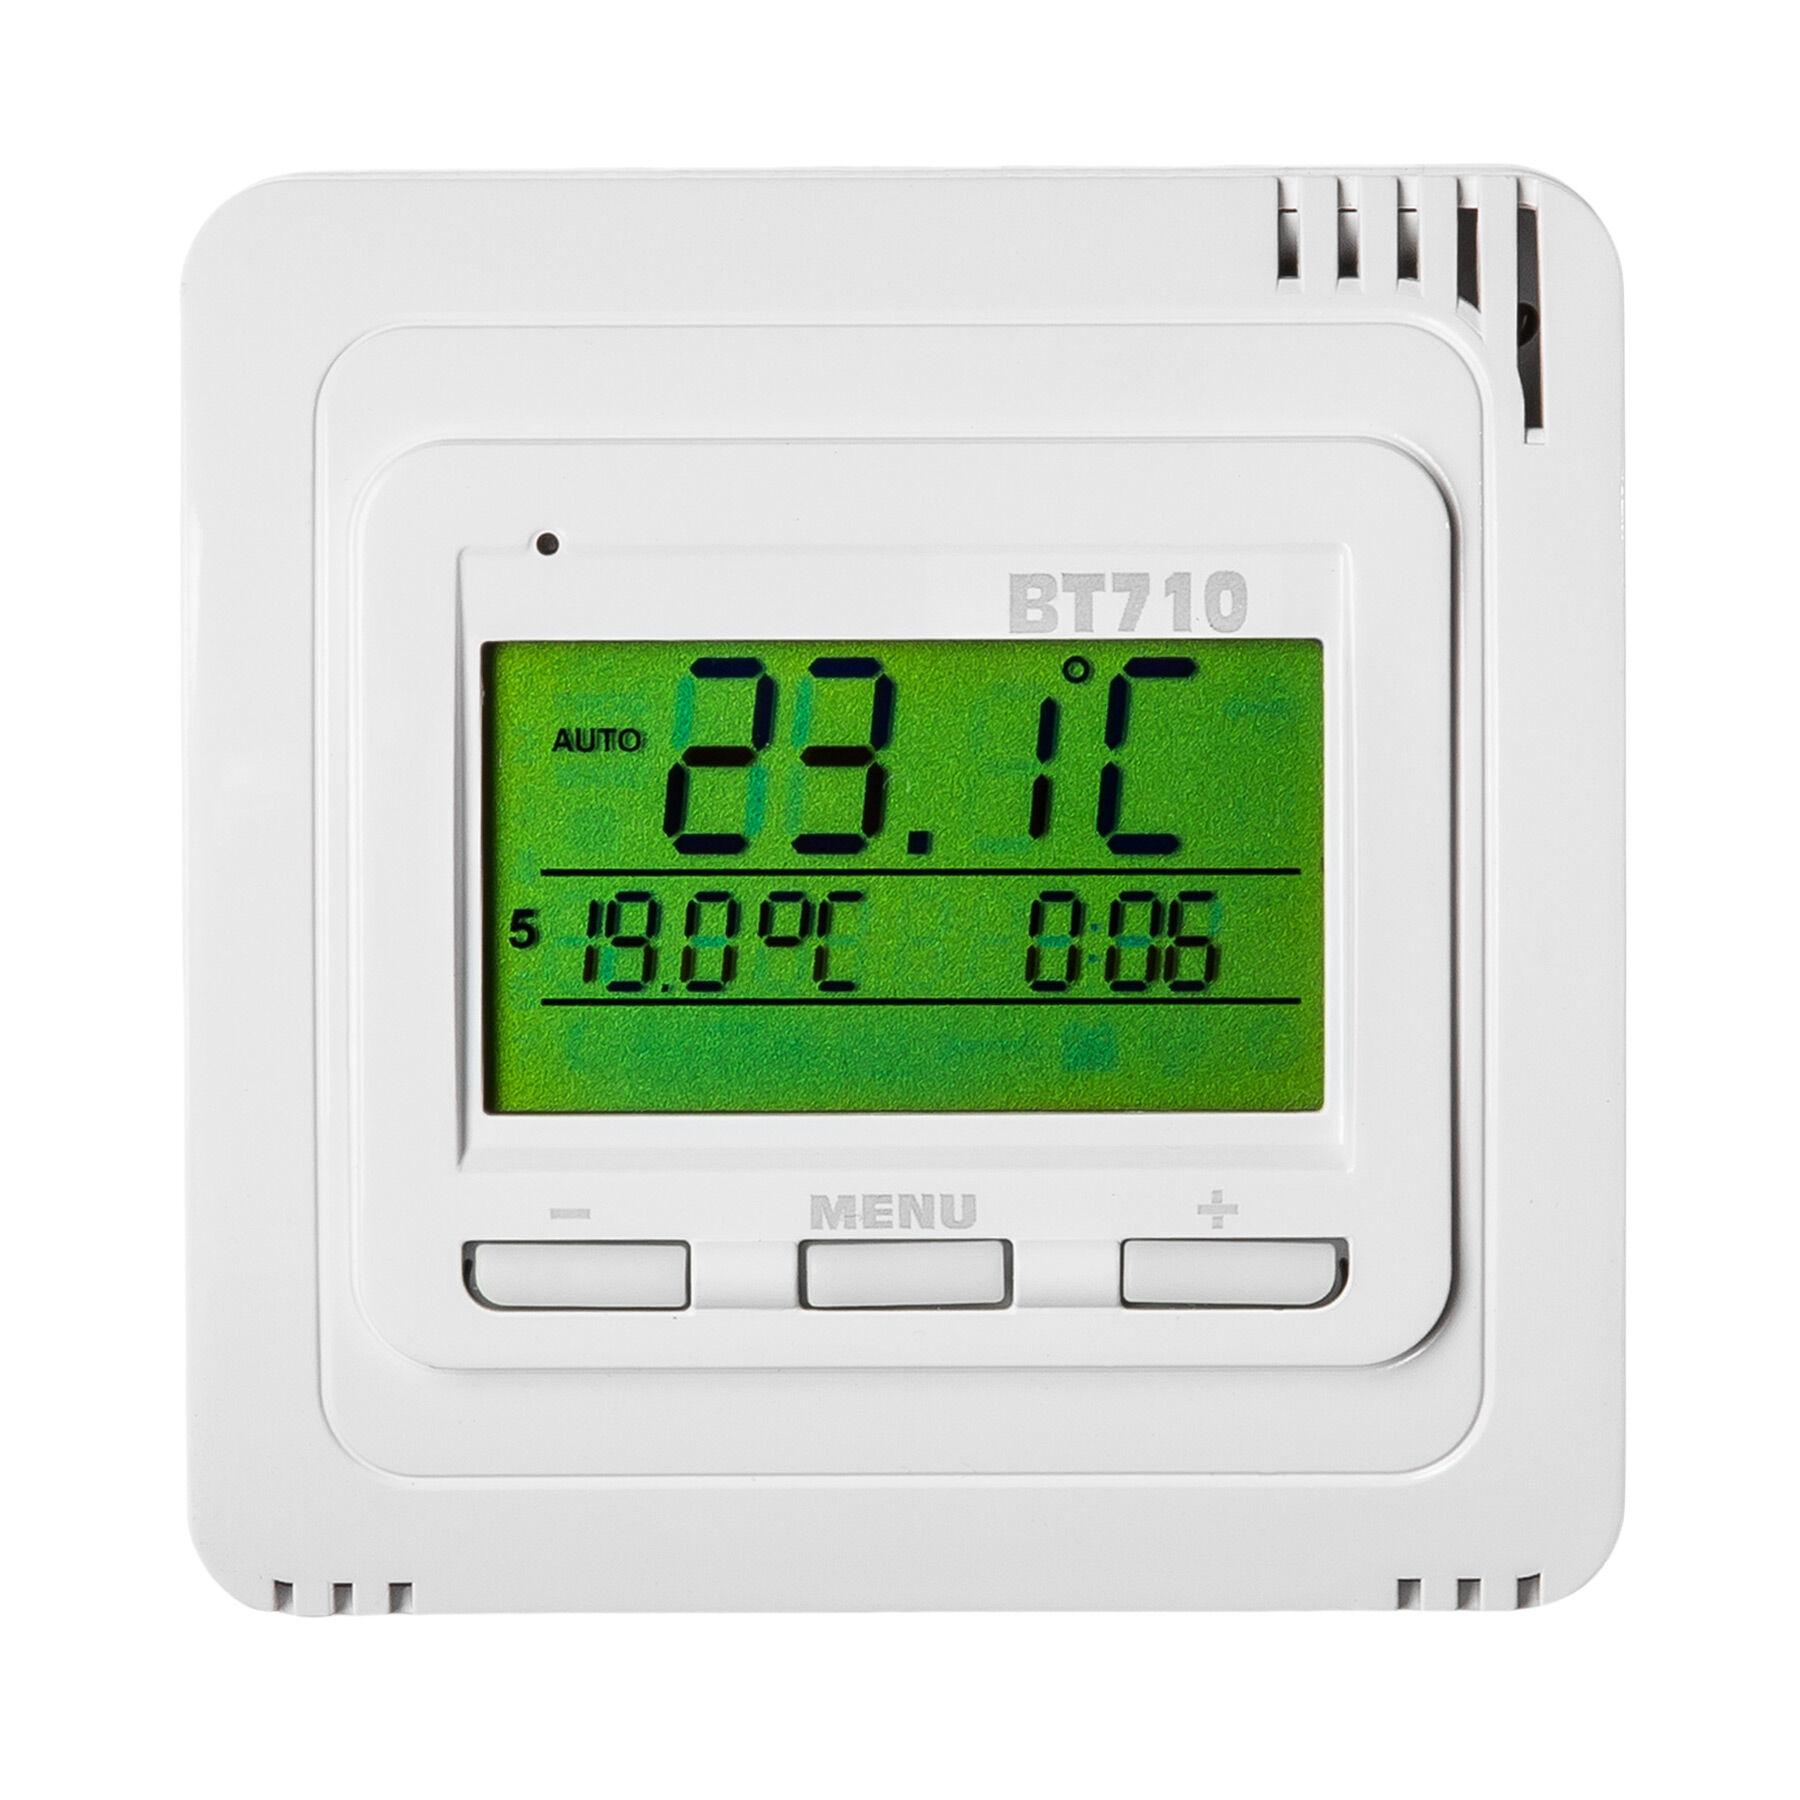 Elektrobock termostato con comando a distanza BPT710 - bianco